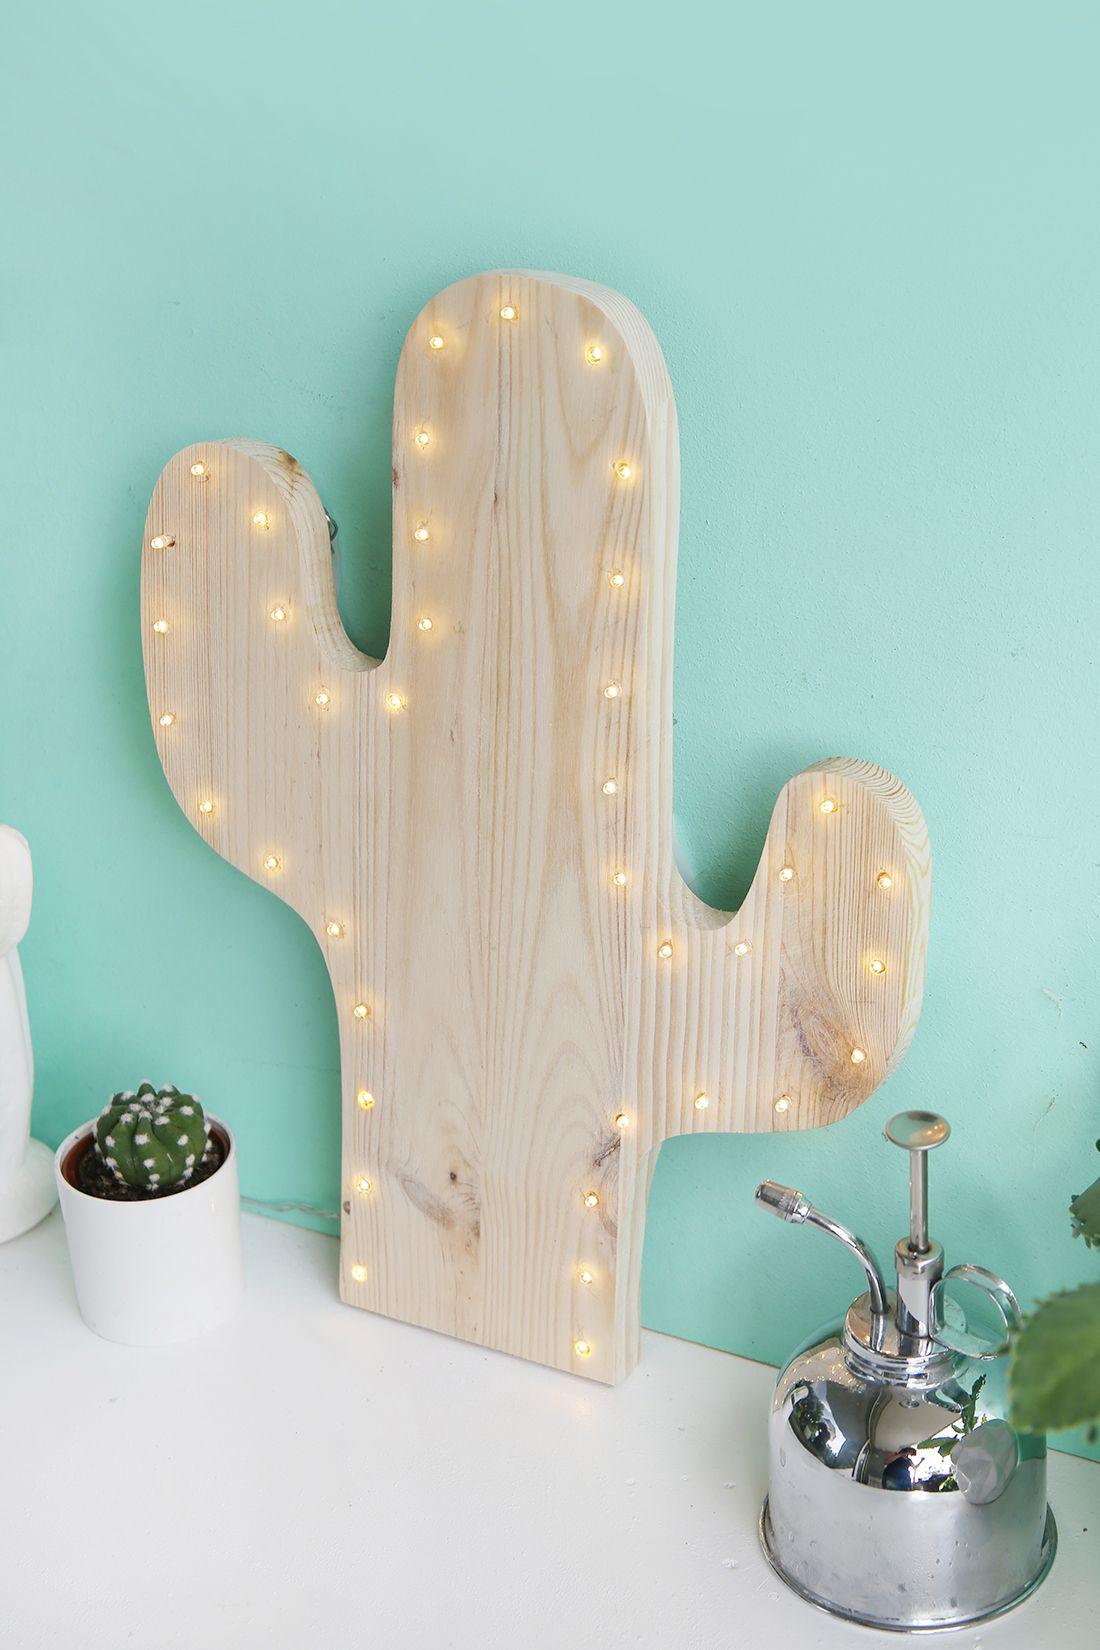 kaktus lampe kühlen bild oder cceaeddeabbbf